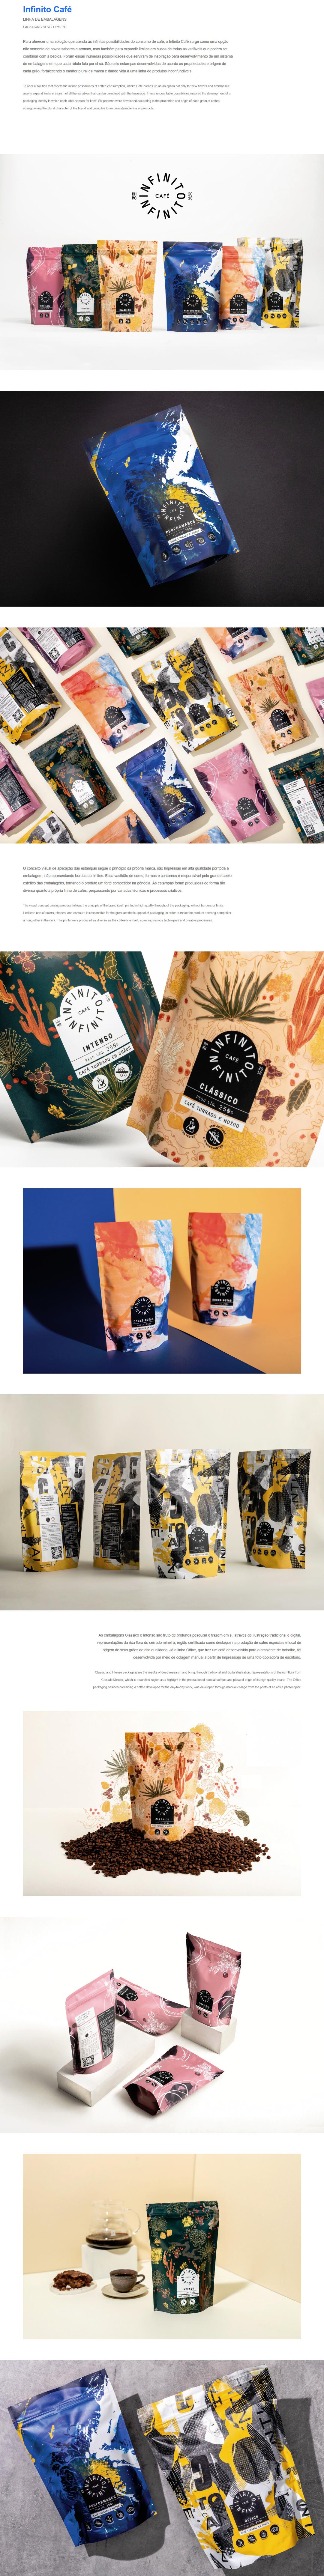 Graphic Design,Pattern Design,Packaging